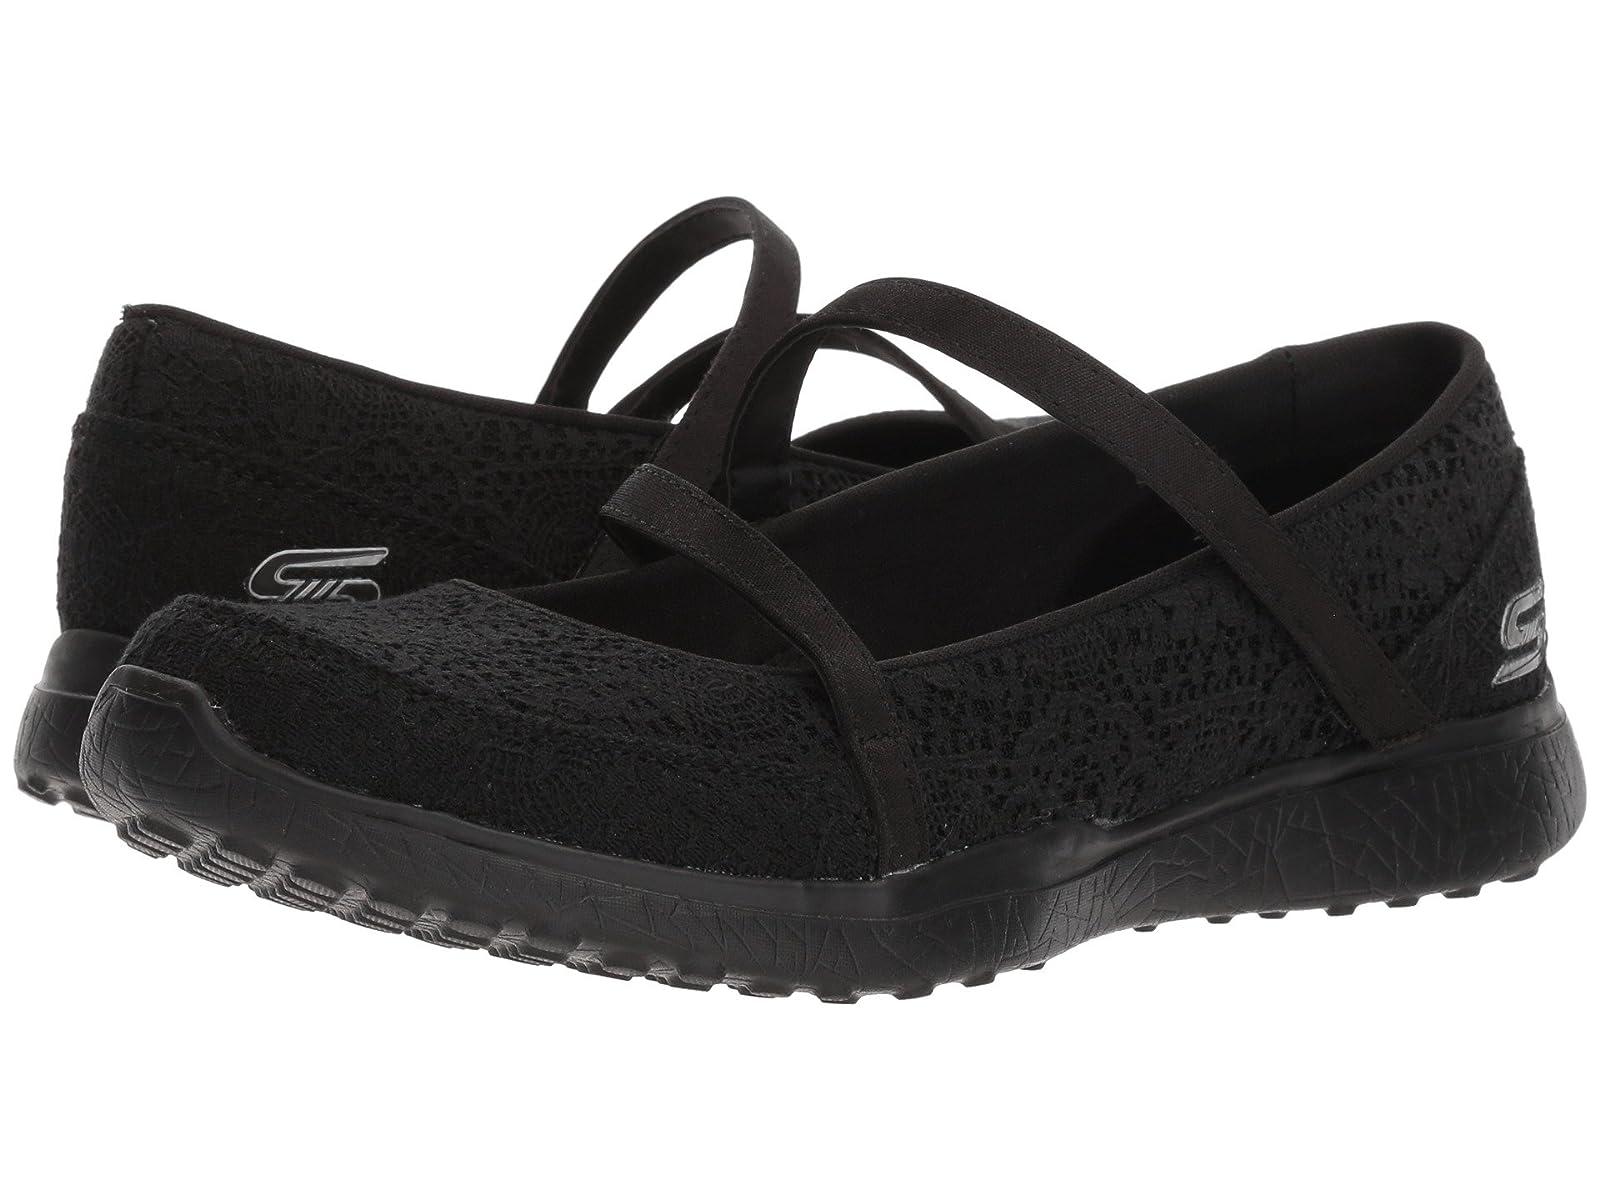 SKECHERS Microburst - Pure EleganceAtmospheric grades have affordable shoes